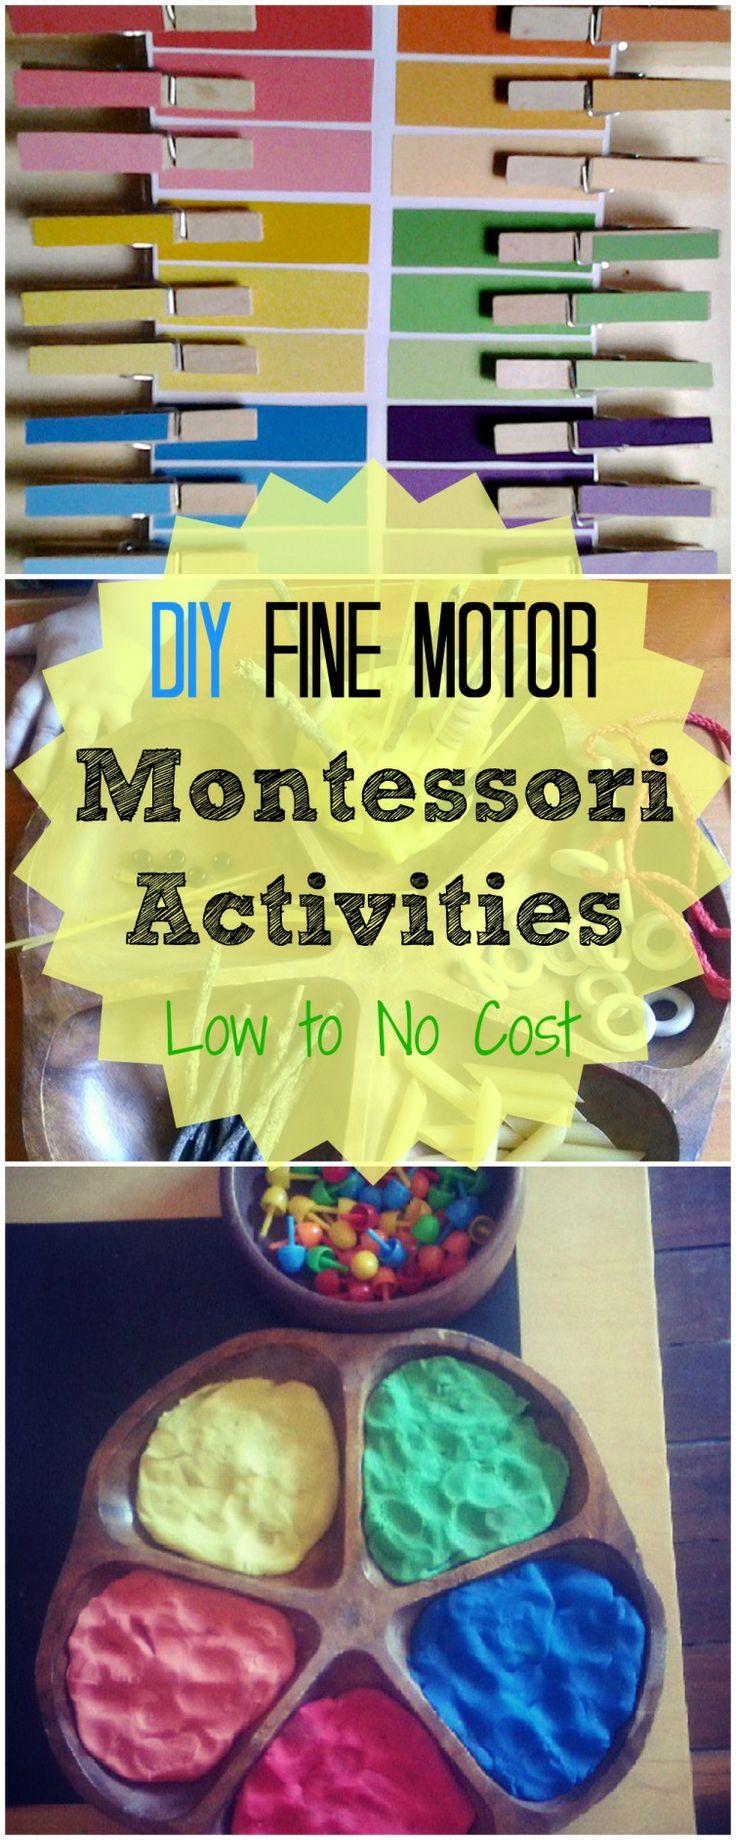 DIY Fine Motor Montessori Activities